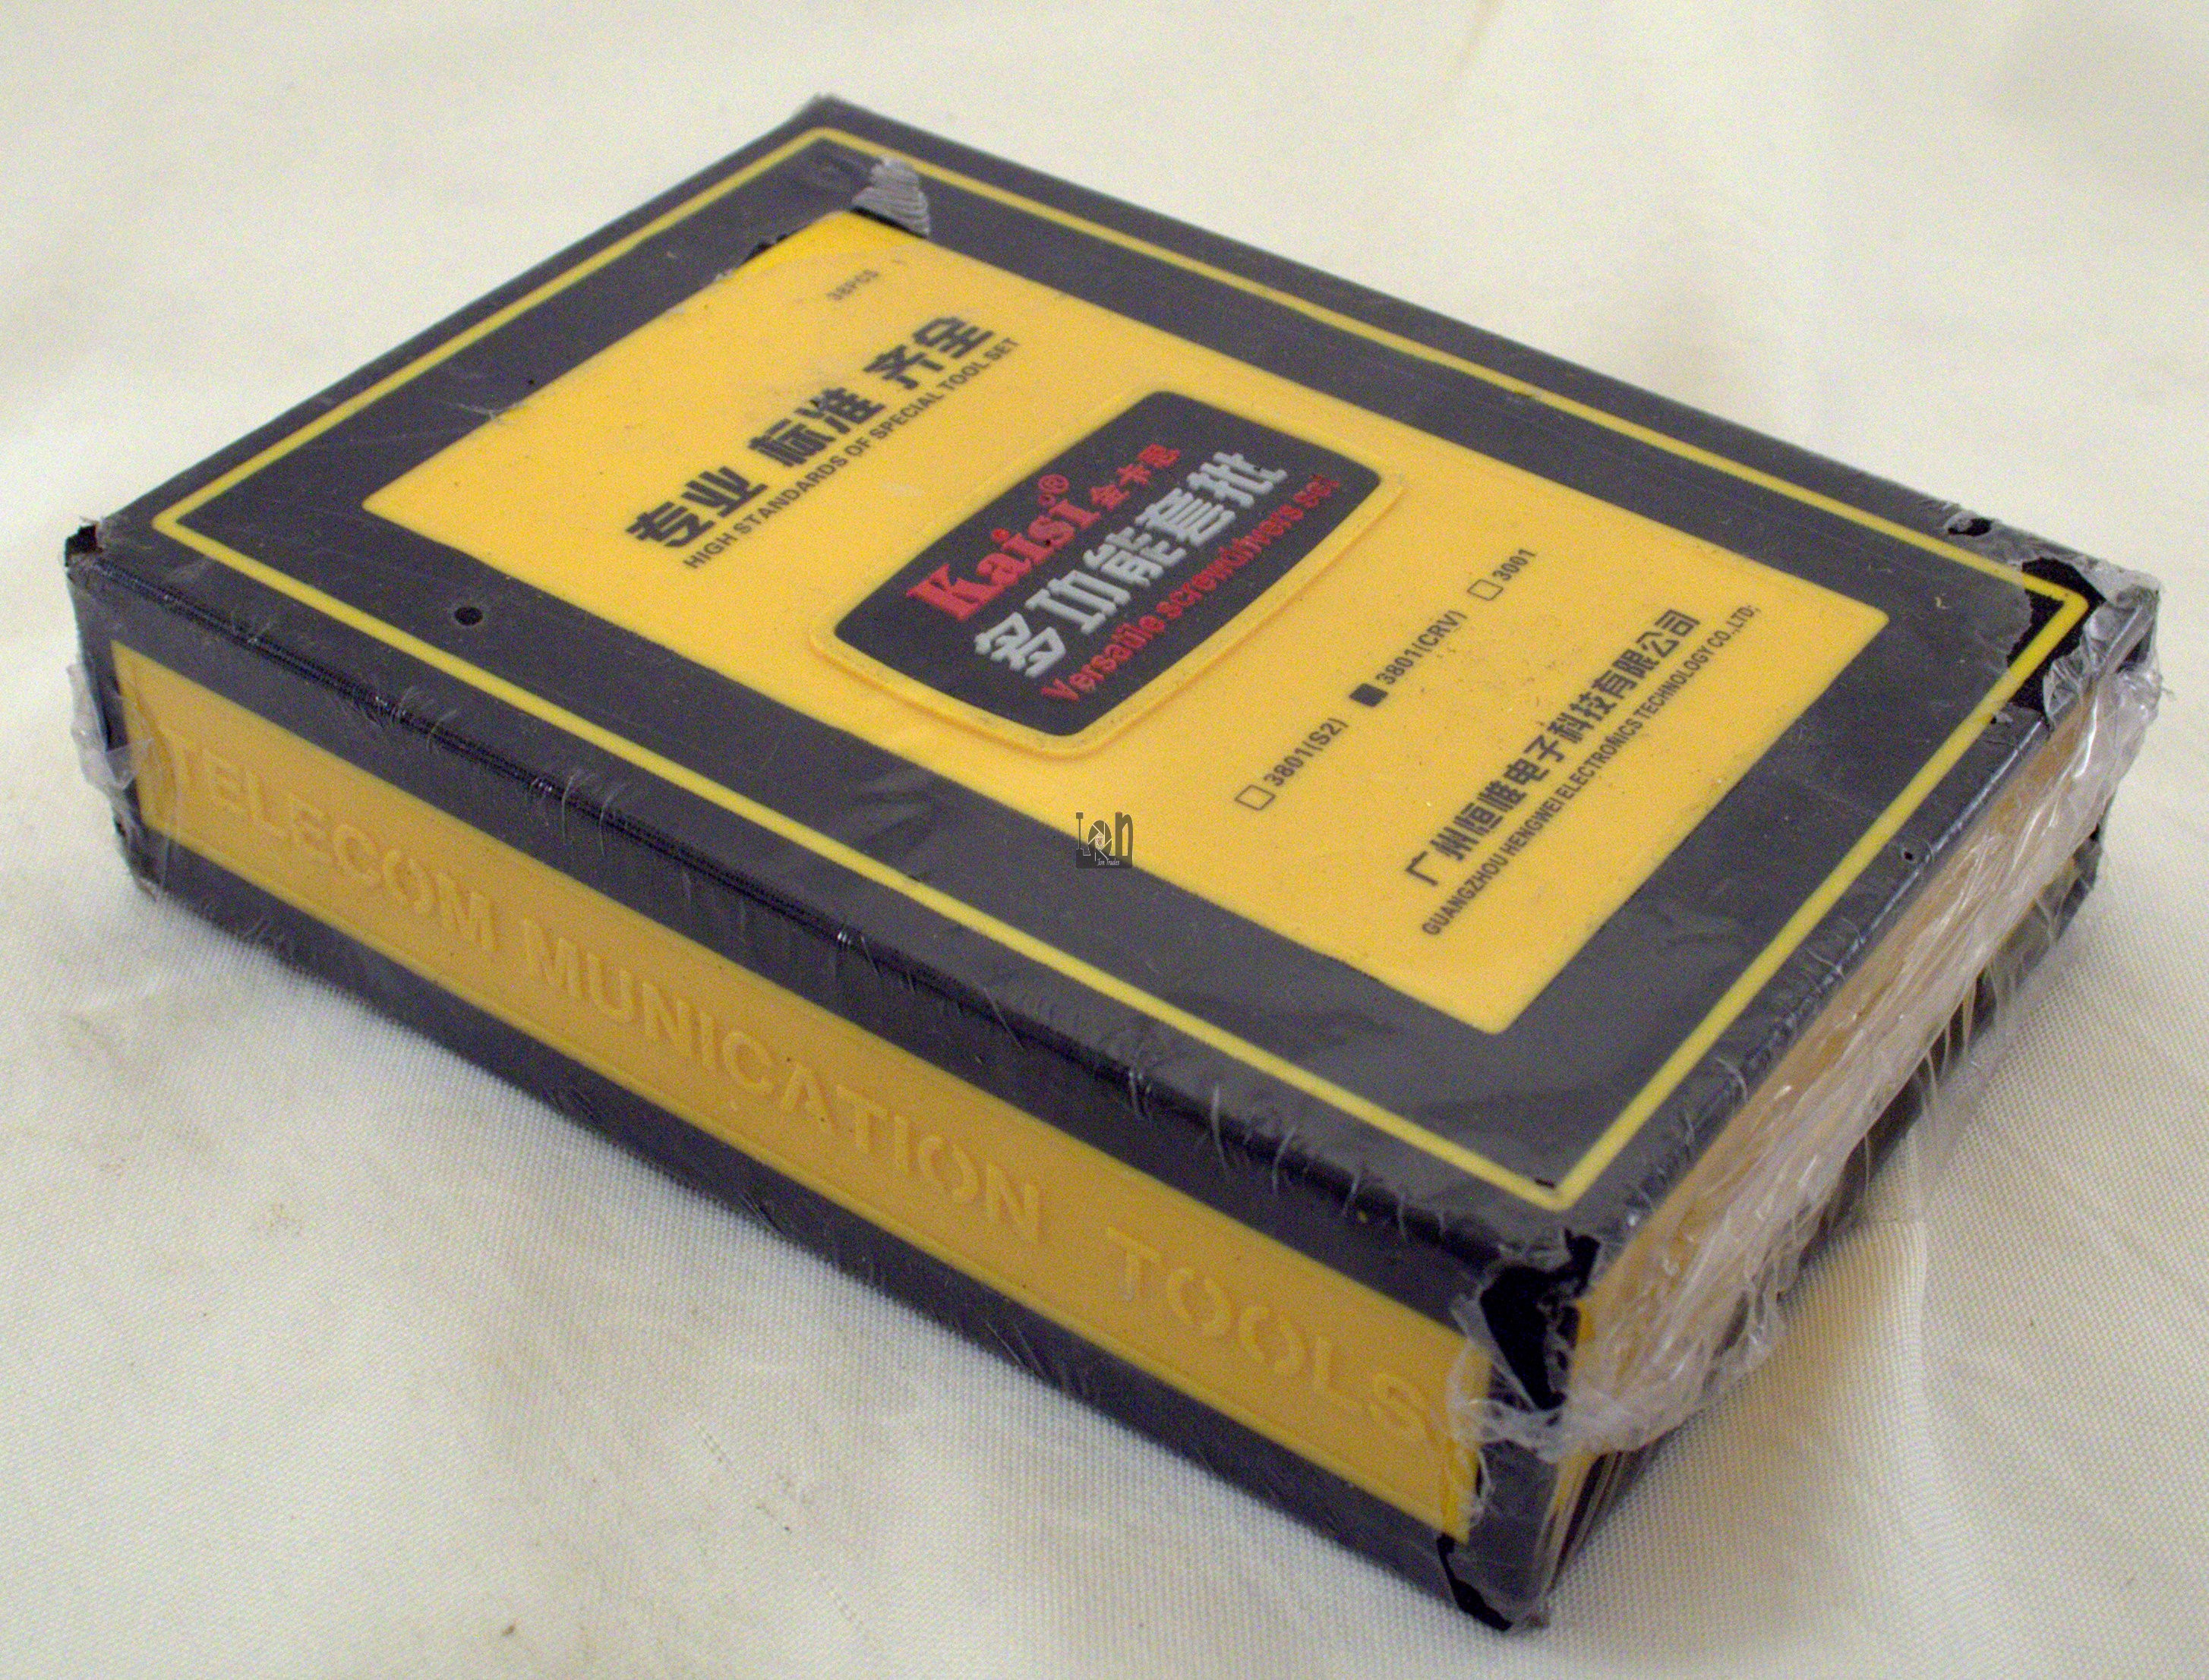 Small Electronics Repair Kit 38-in-1 Precision Screwdriver Tool Set